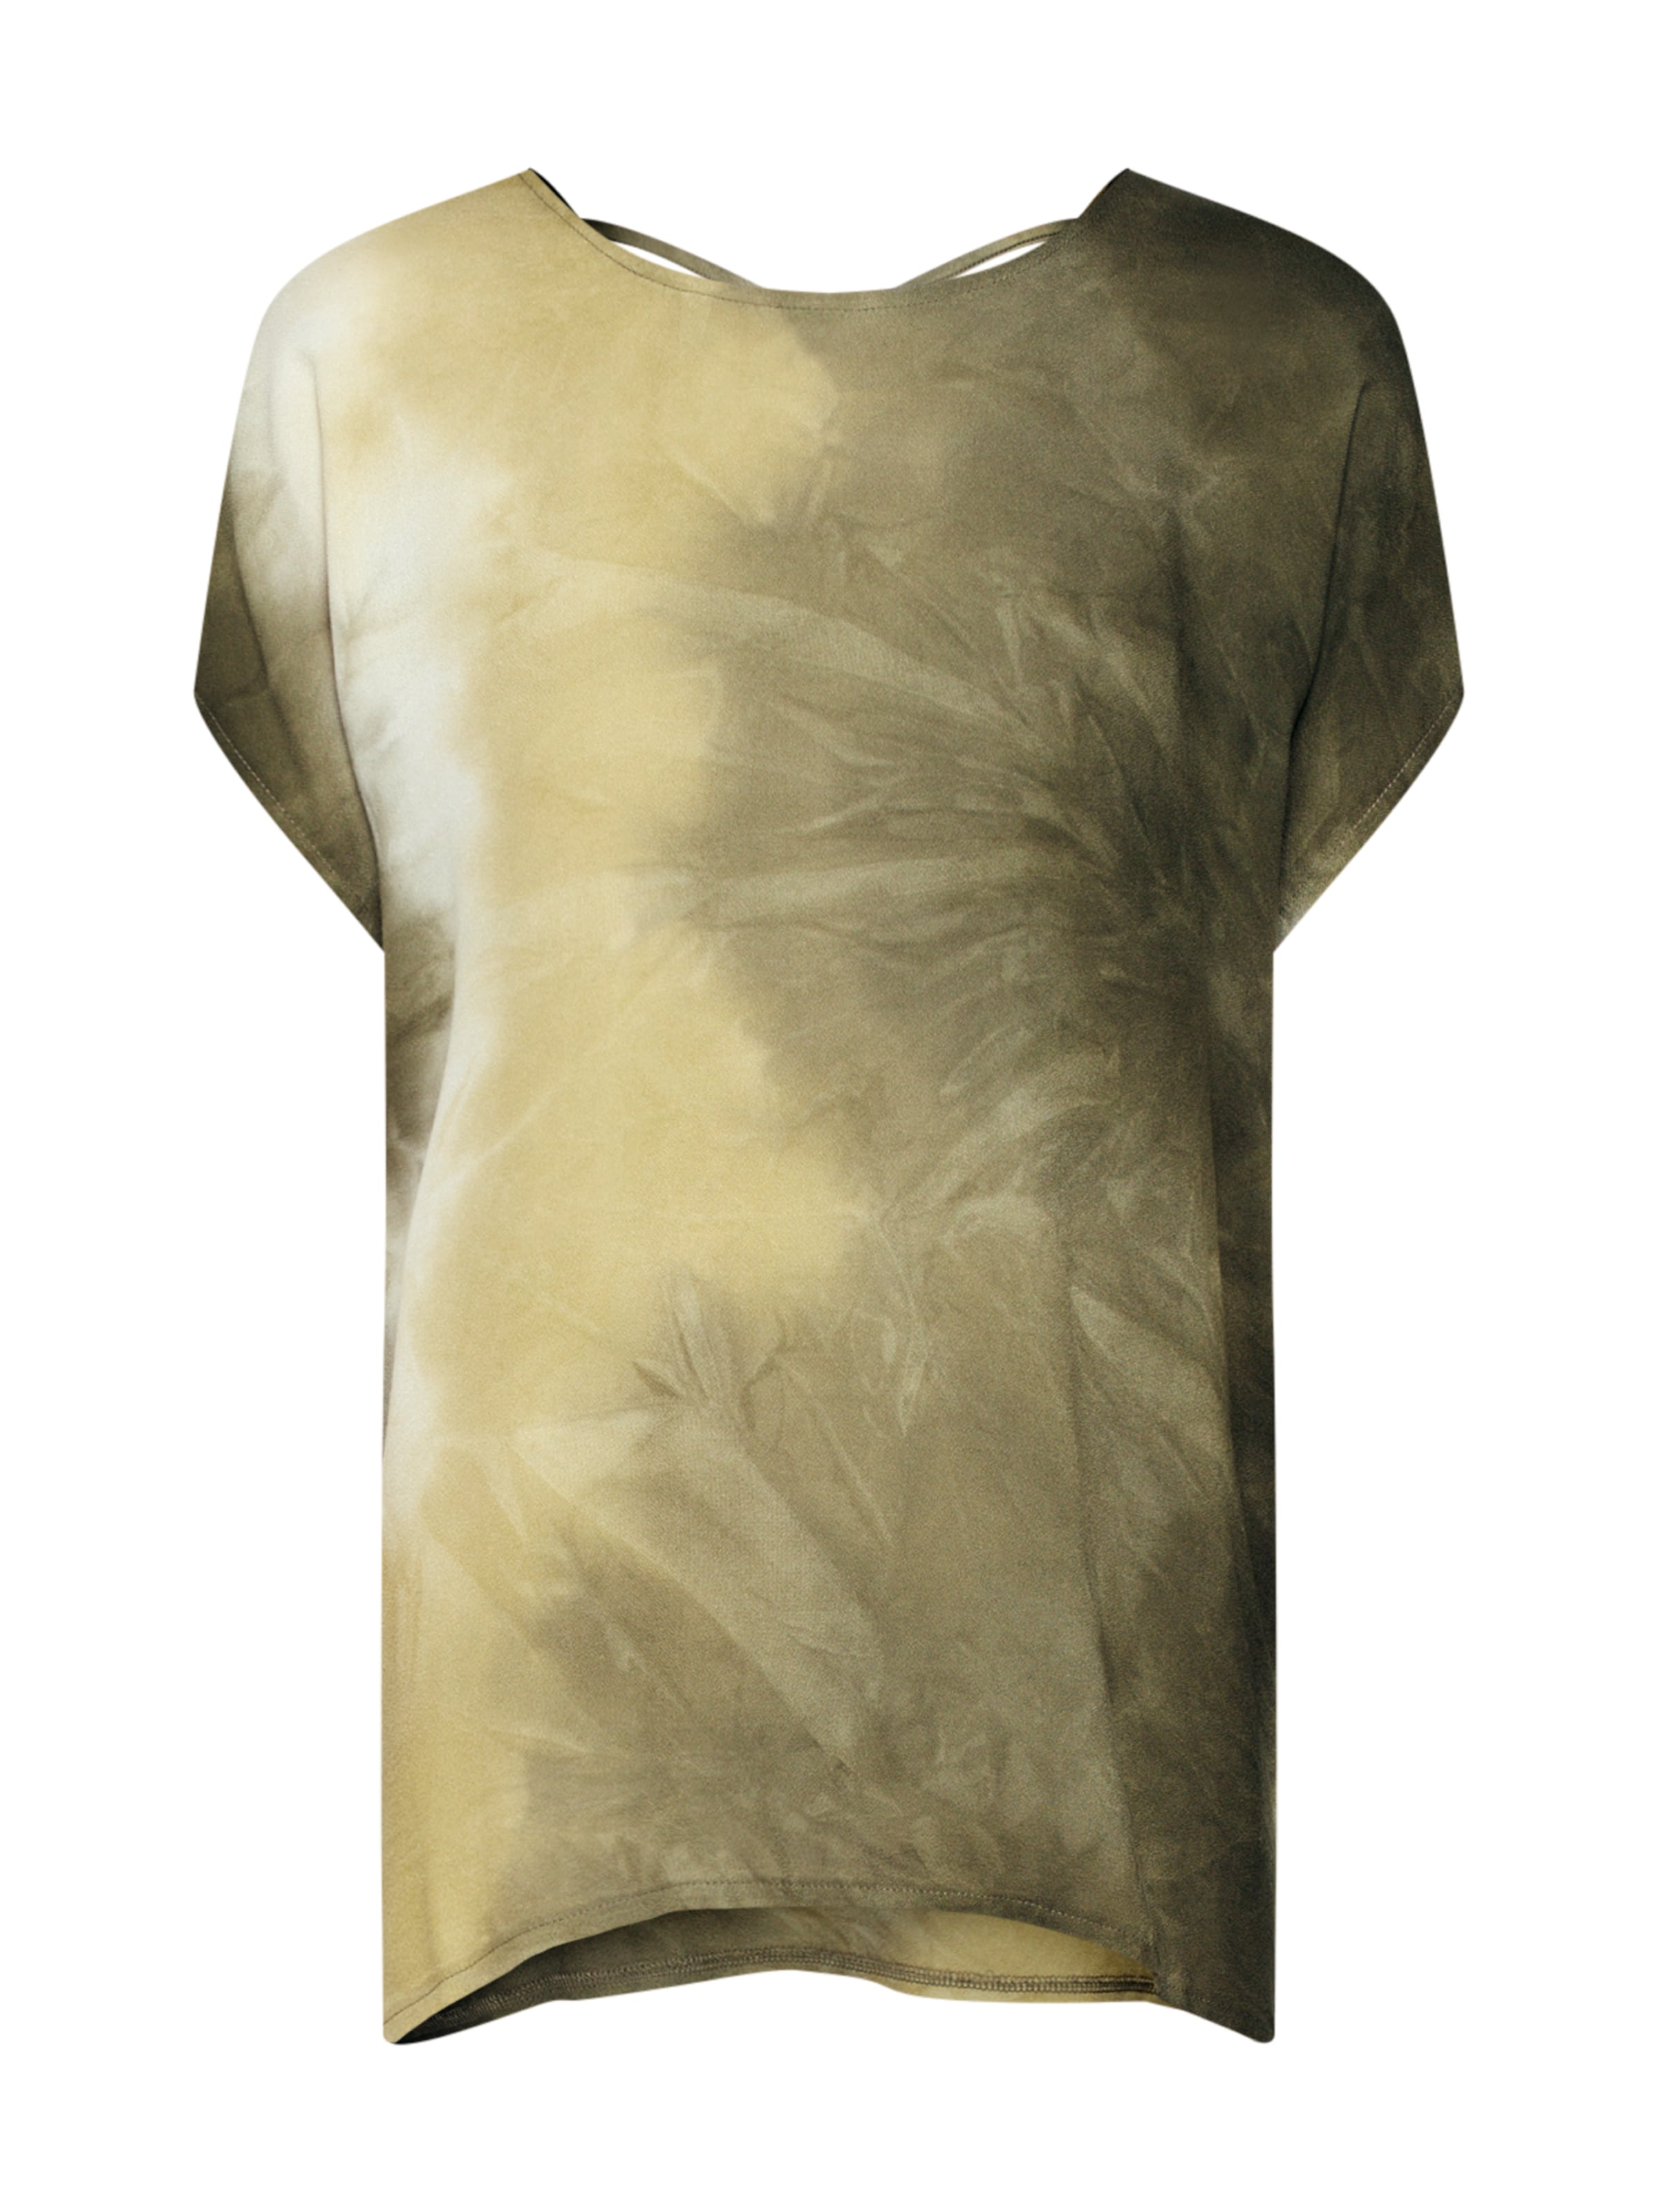 'chinara' shirt Couleurs About De You KakiMélange En T qMGpUSzV